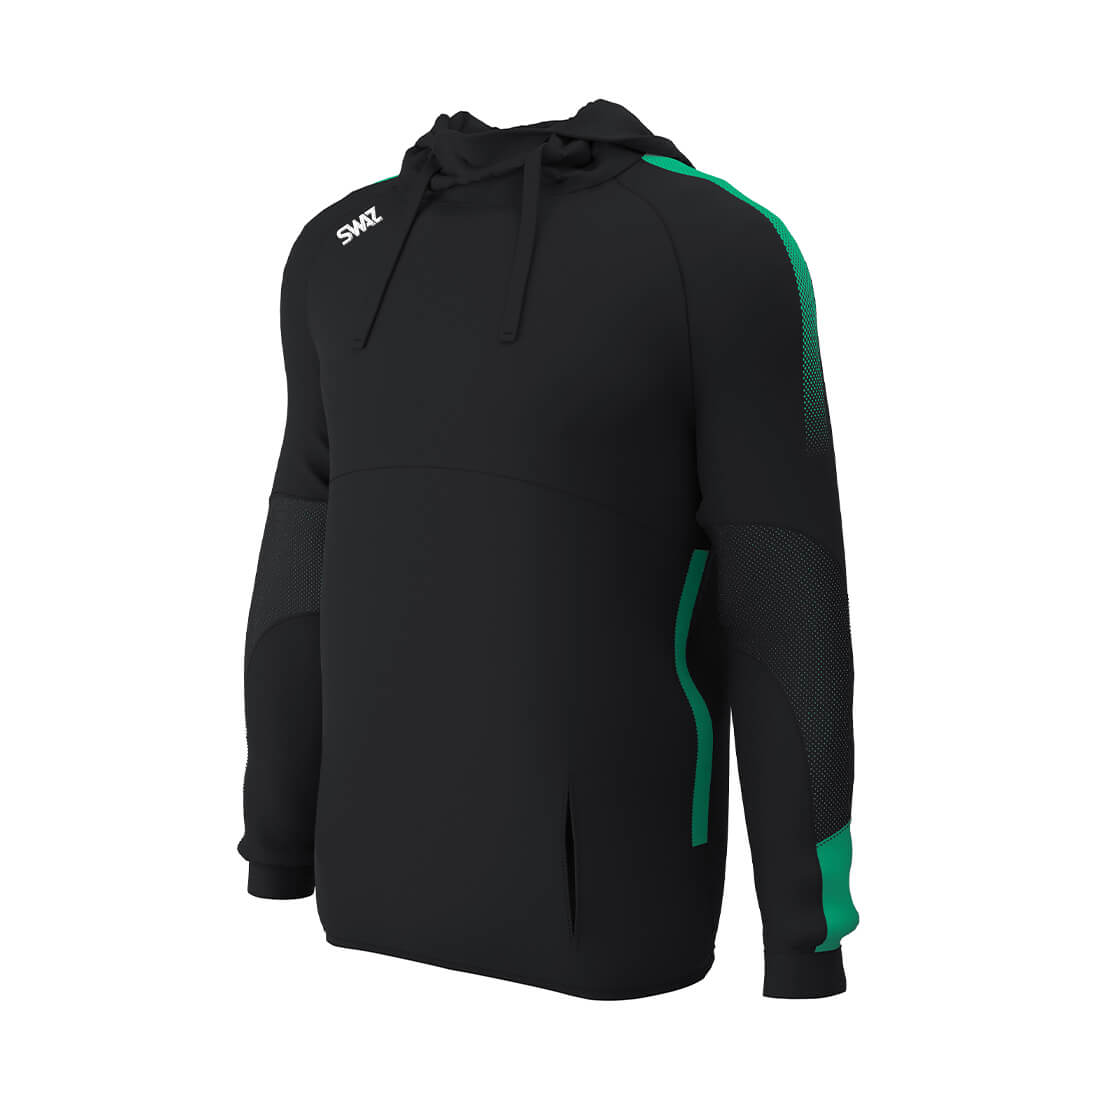 Elite Youth Football Hoody | Football Training Kit and Teamwear – SWAZ